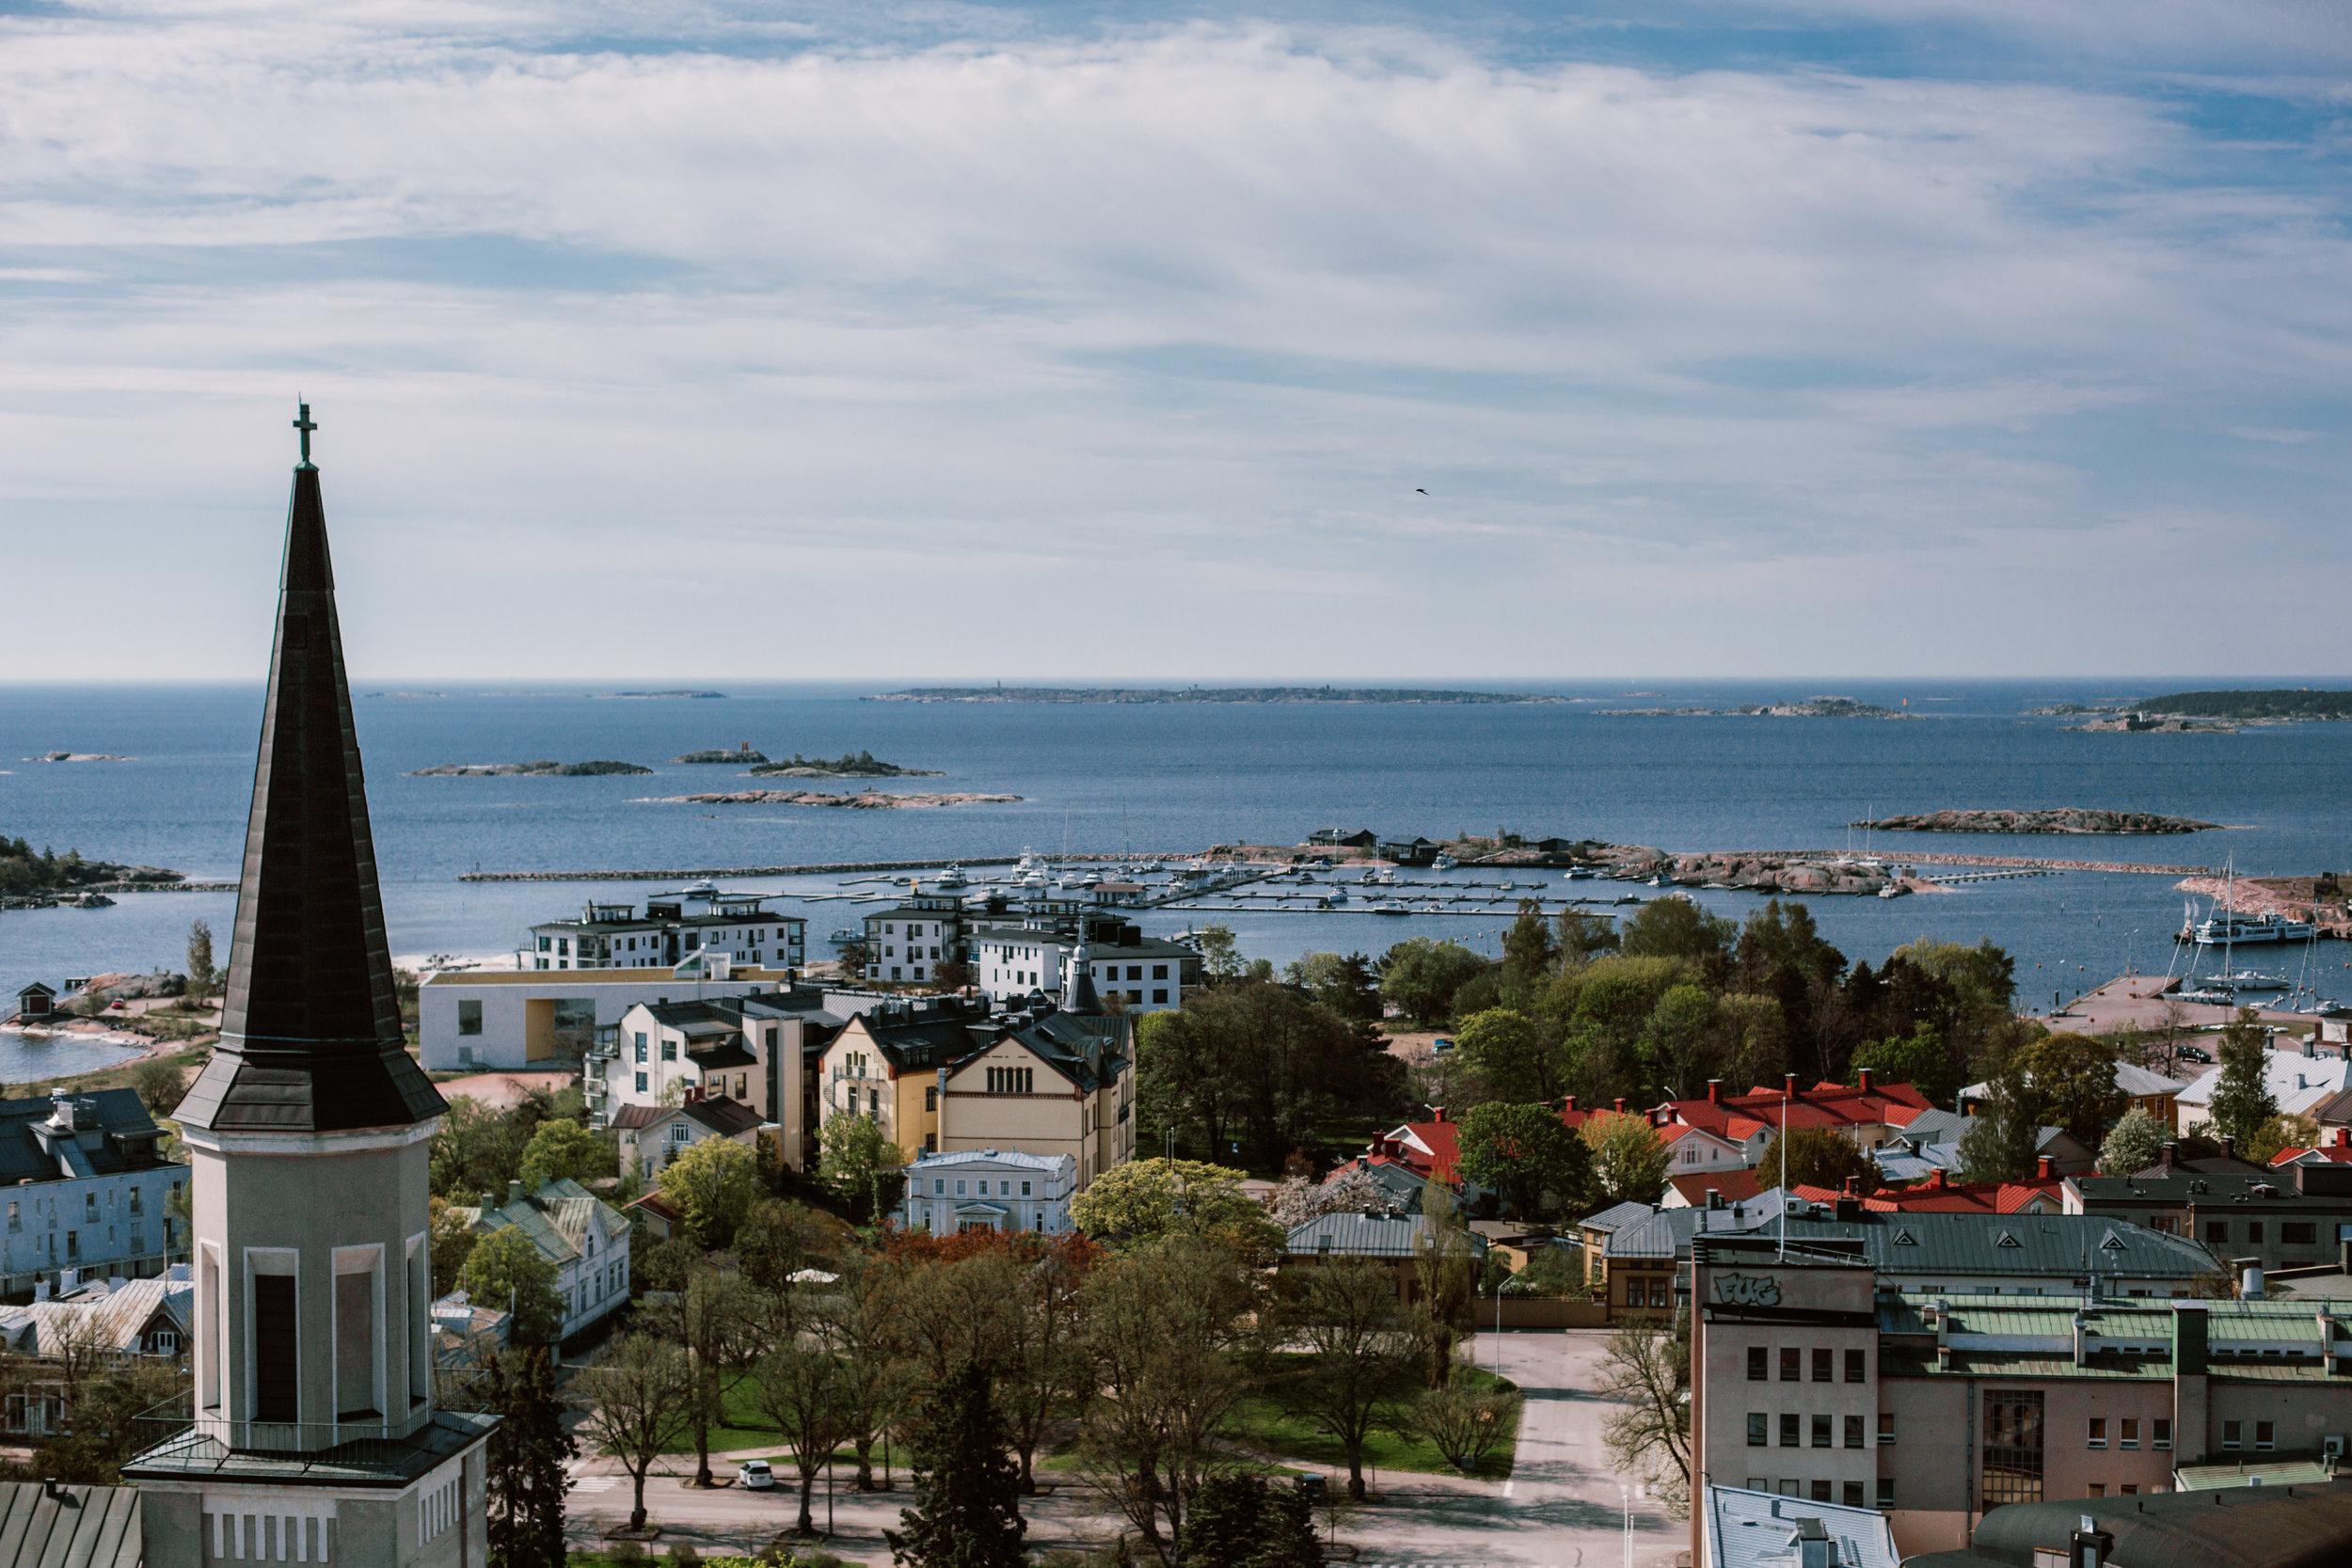 Finland_0519_0116.JPG